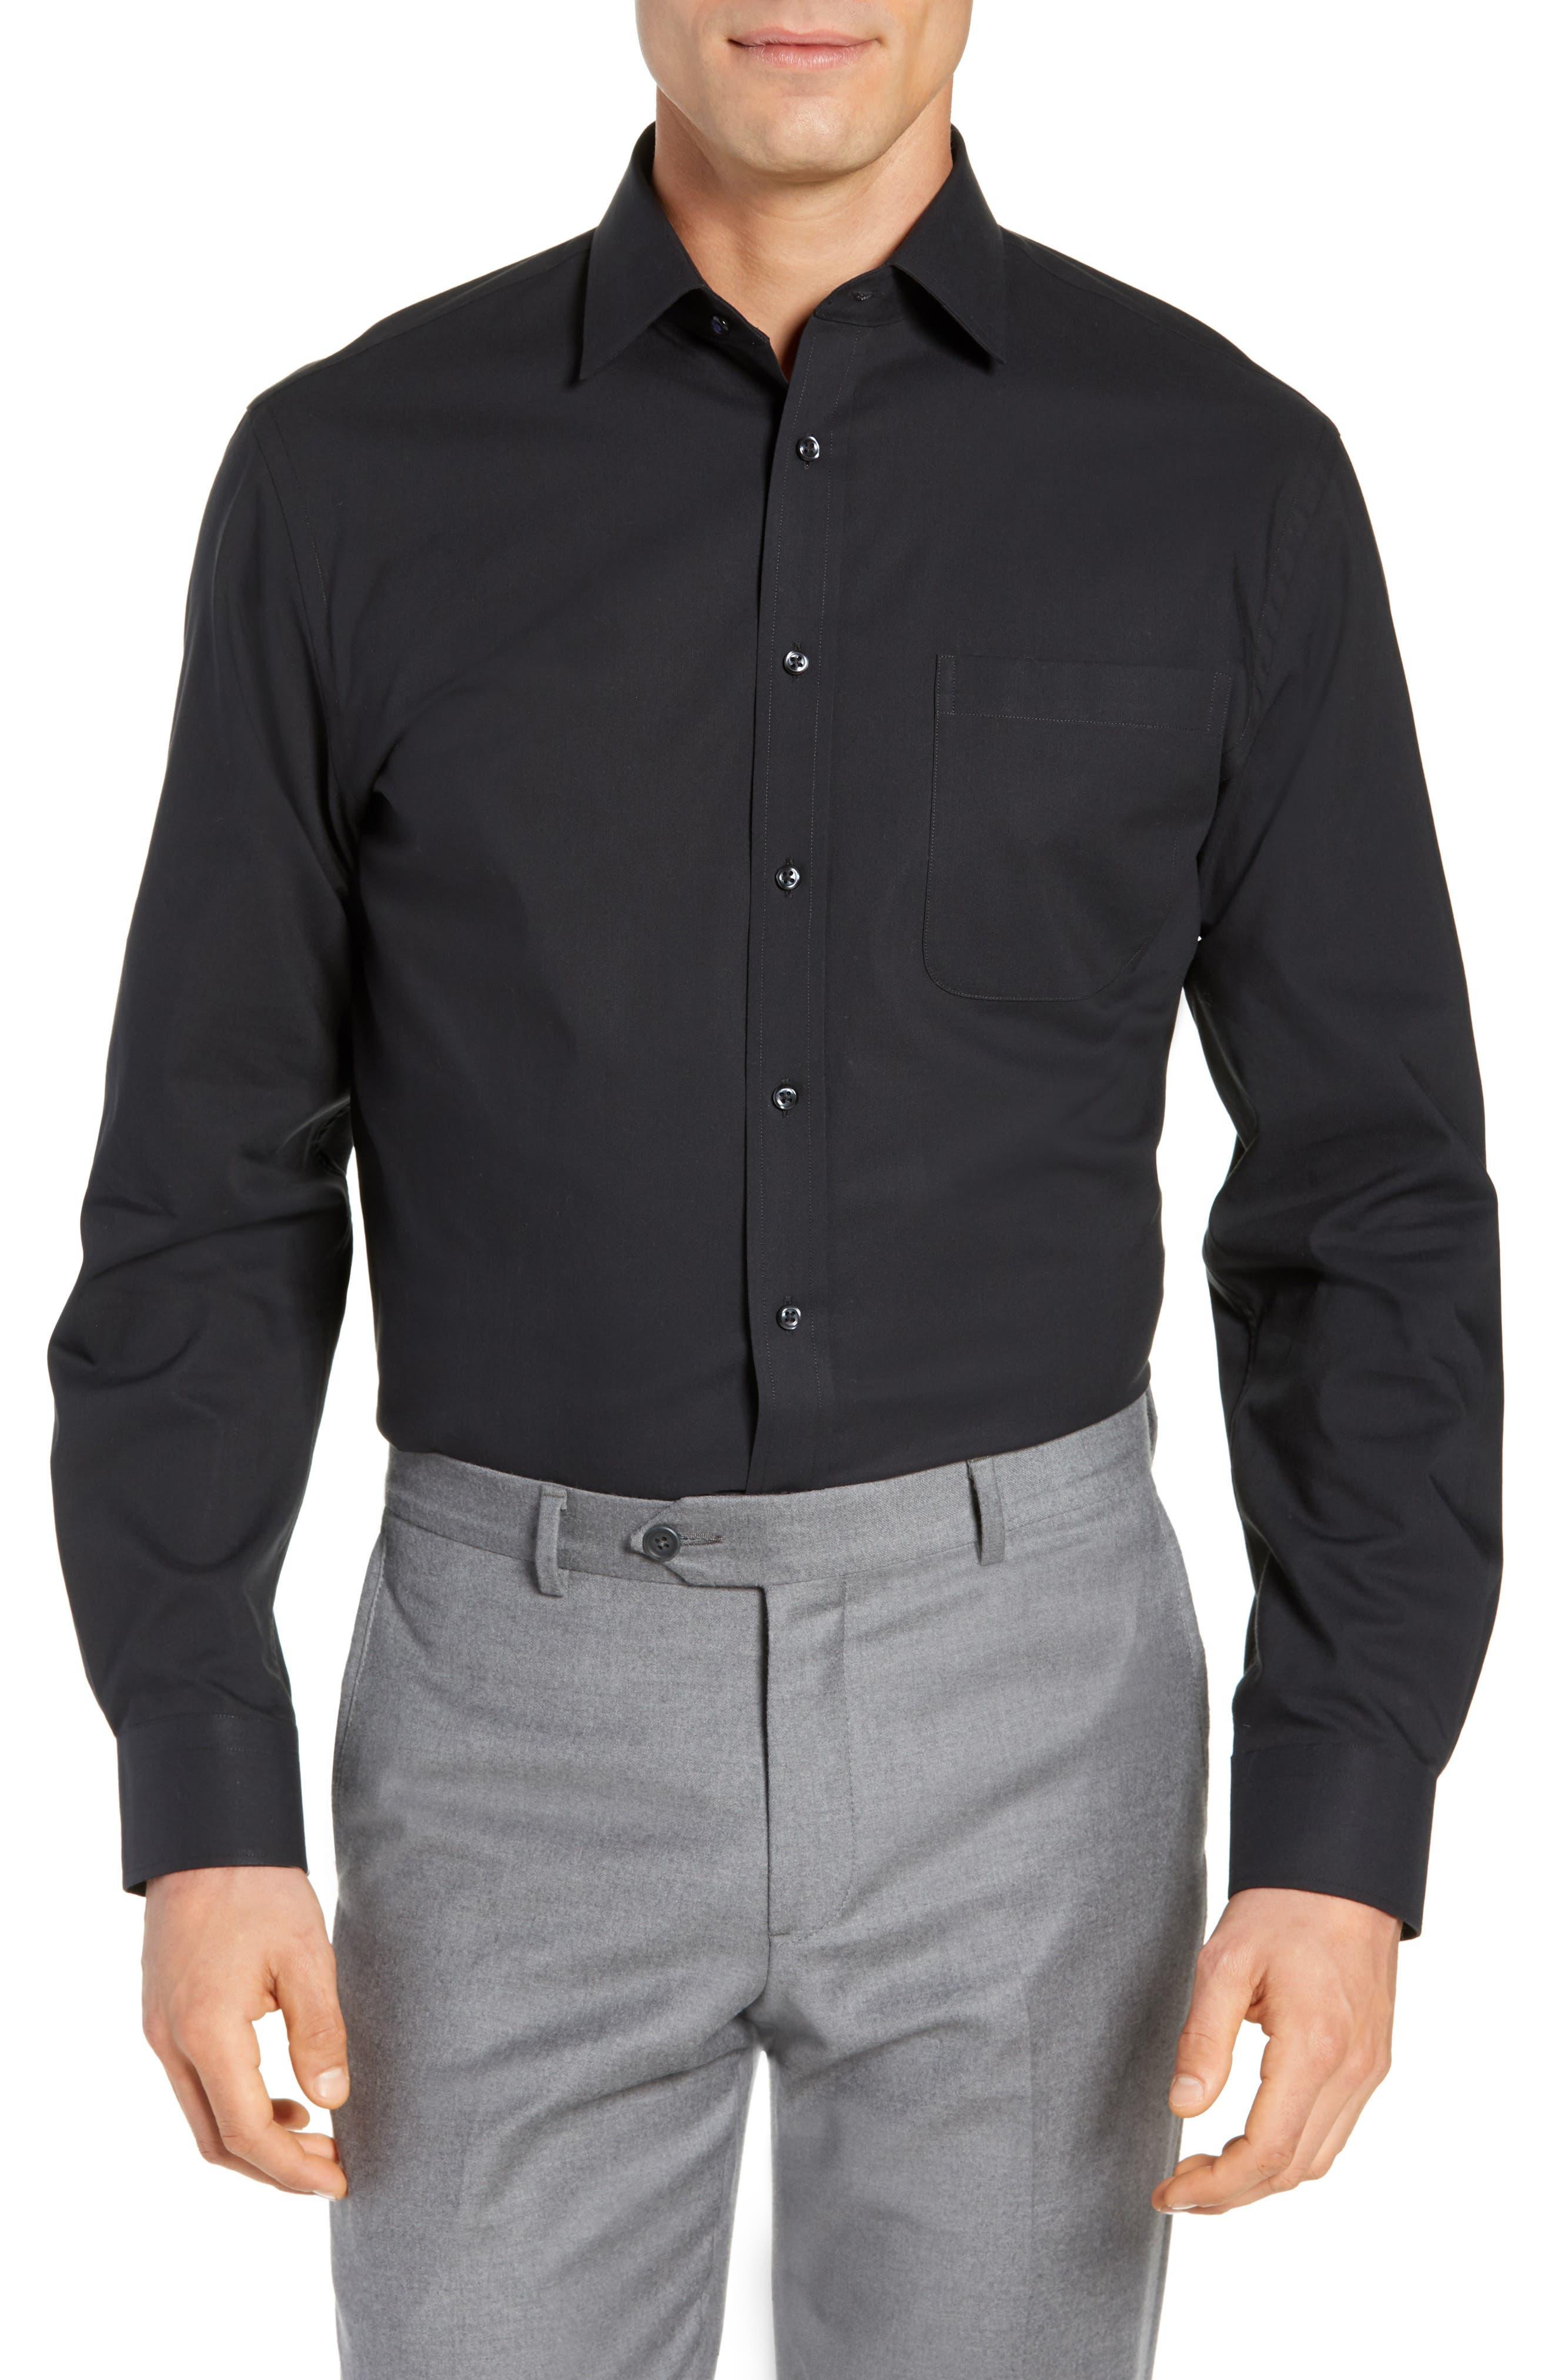 NORDSTROM MEN'S SHOP Tech-Smart Traditional Fit Stretch Pinpoint Dress Shirt, Main, color, BLACK ROCK